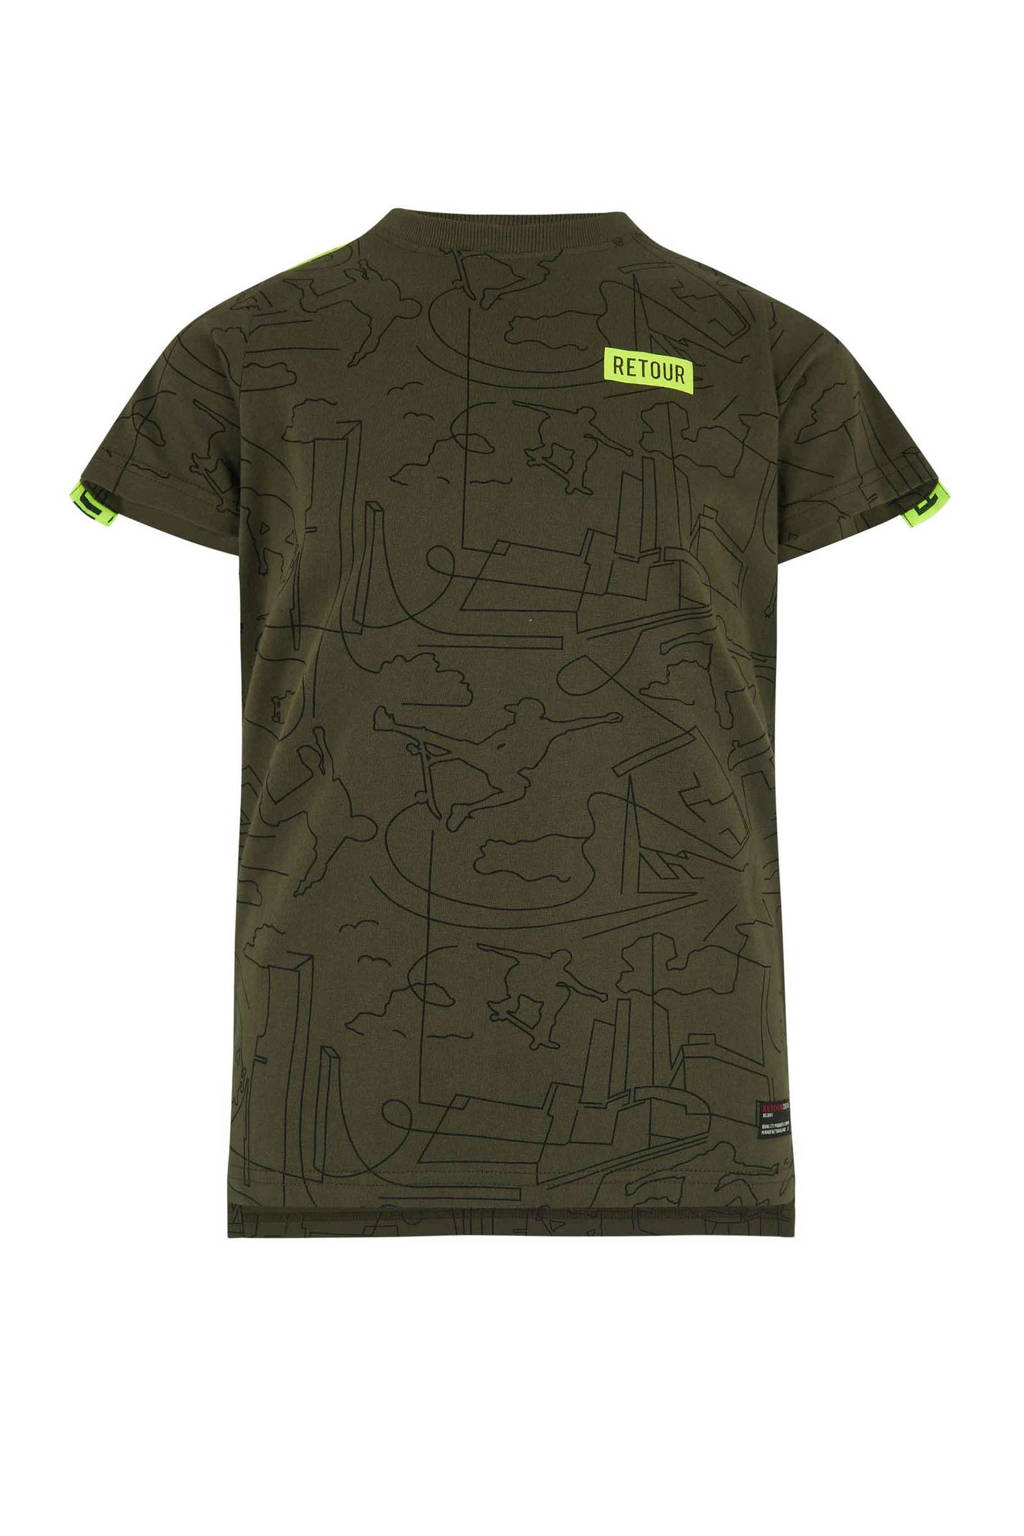 Retour Denim T-shirt met alloverprint Robert army, Army groen